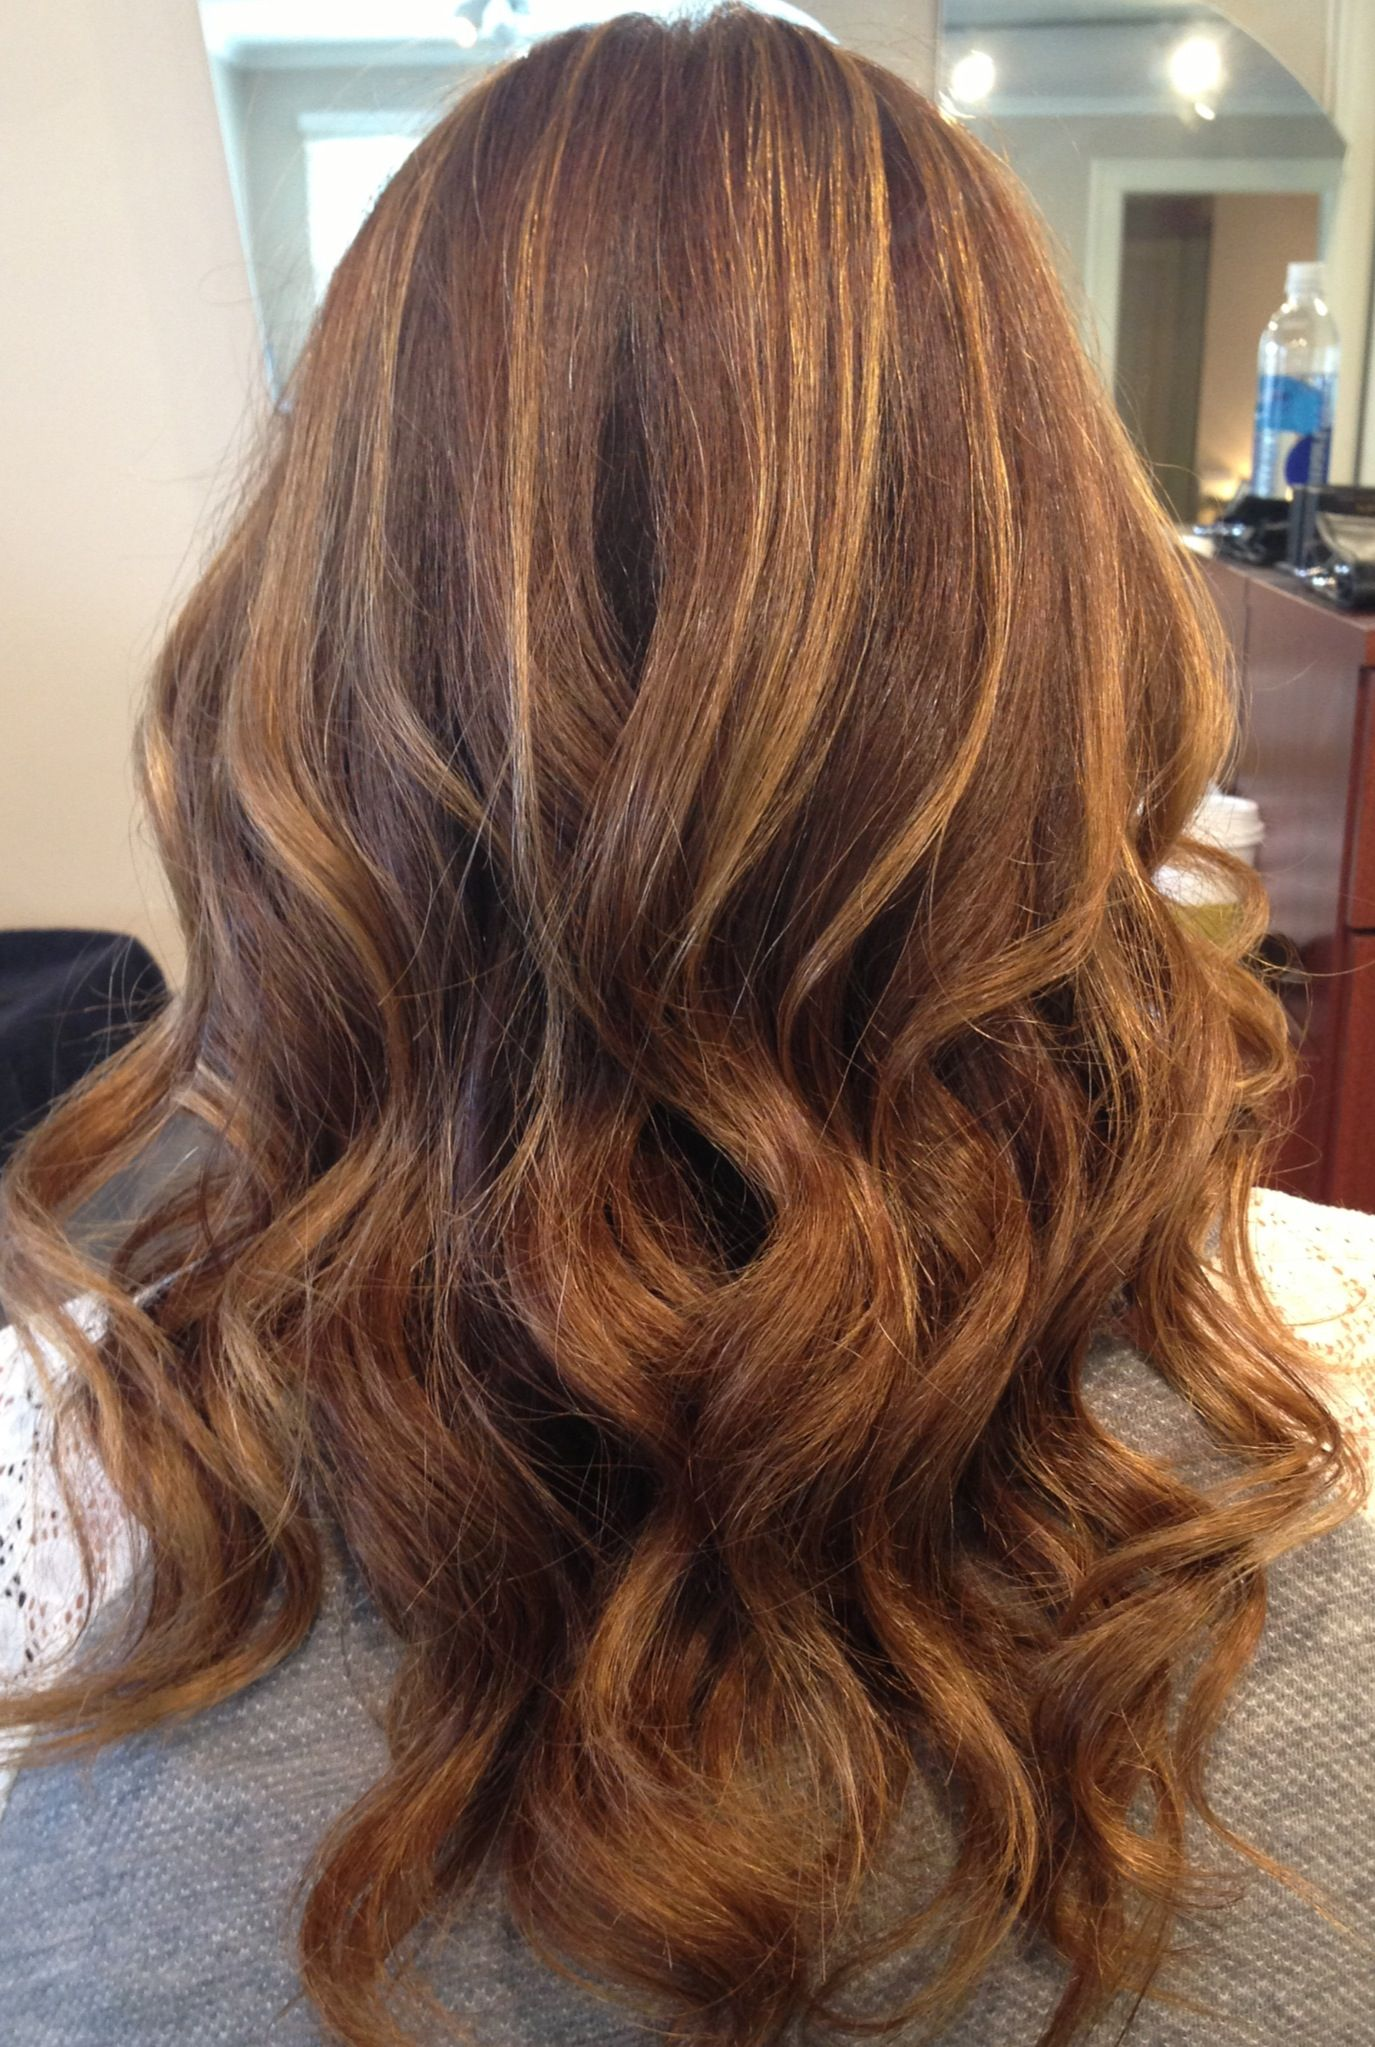 Wallpaper copper and blonde highlights on dark brown hair for desktop hd pics brunette golden perfect auburn